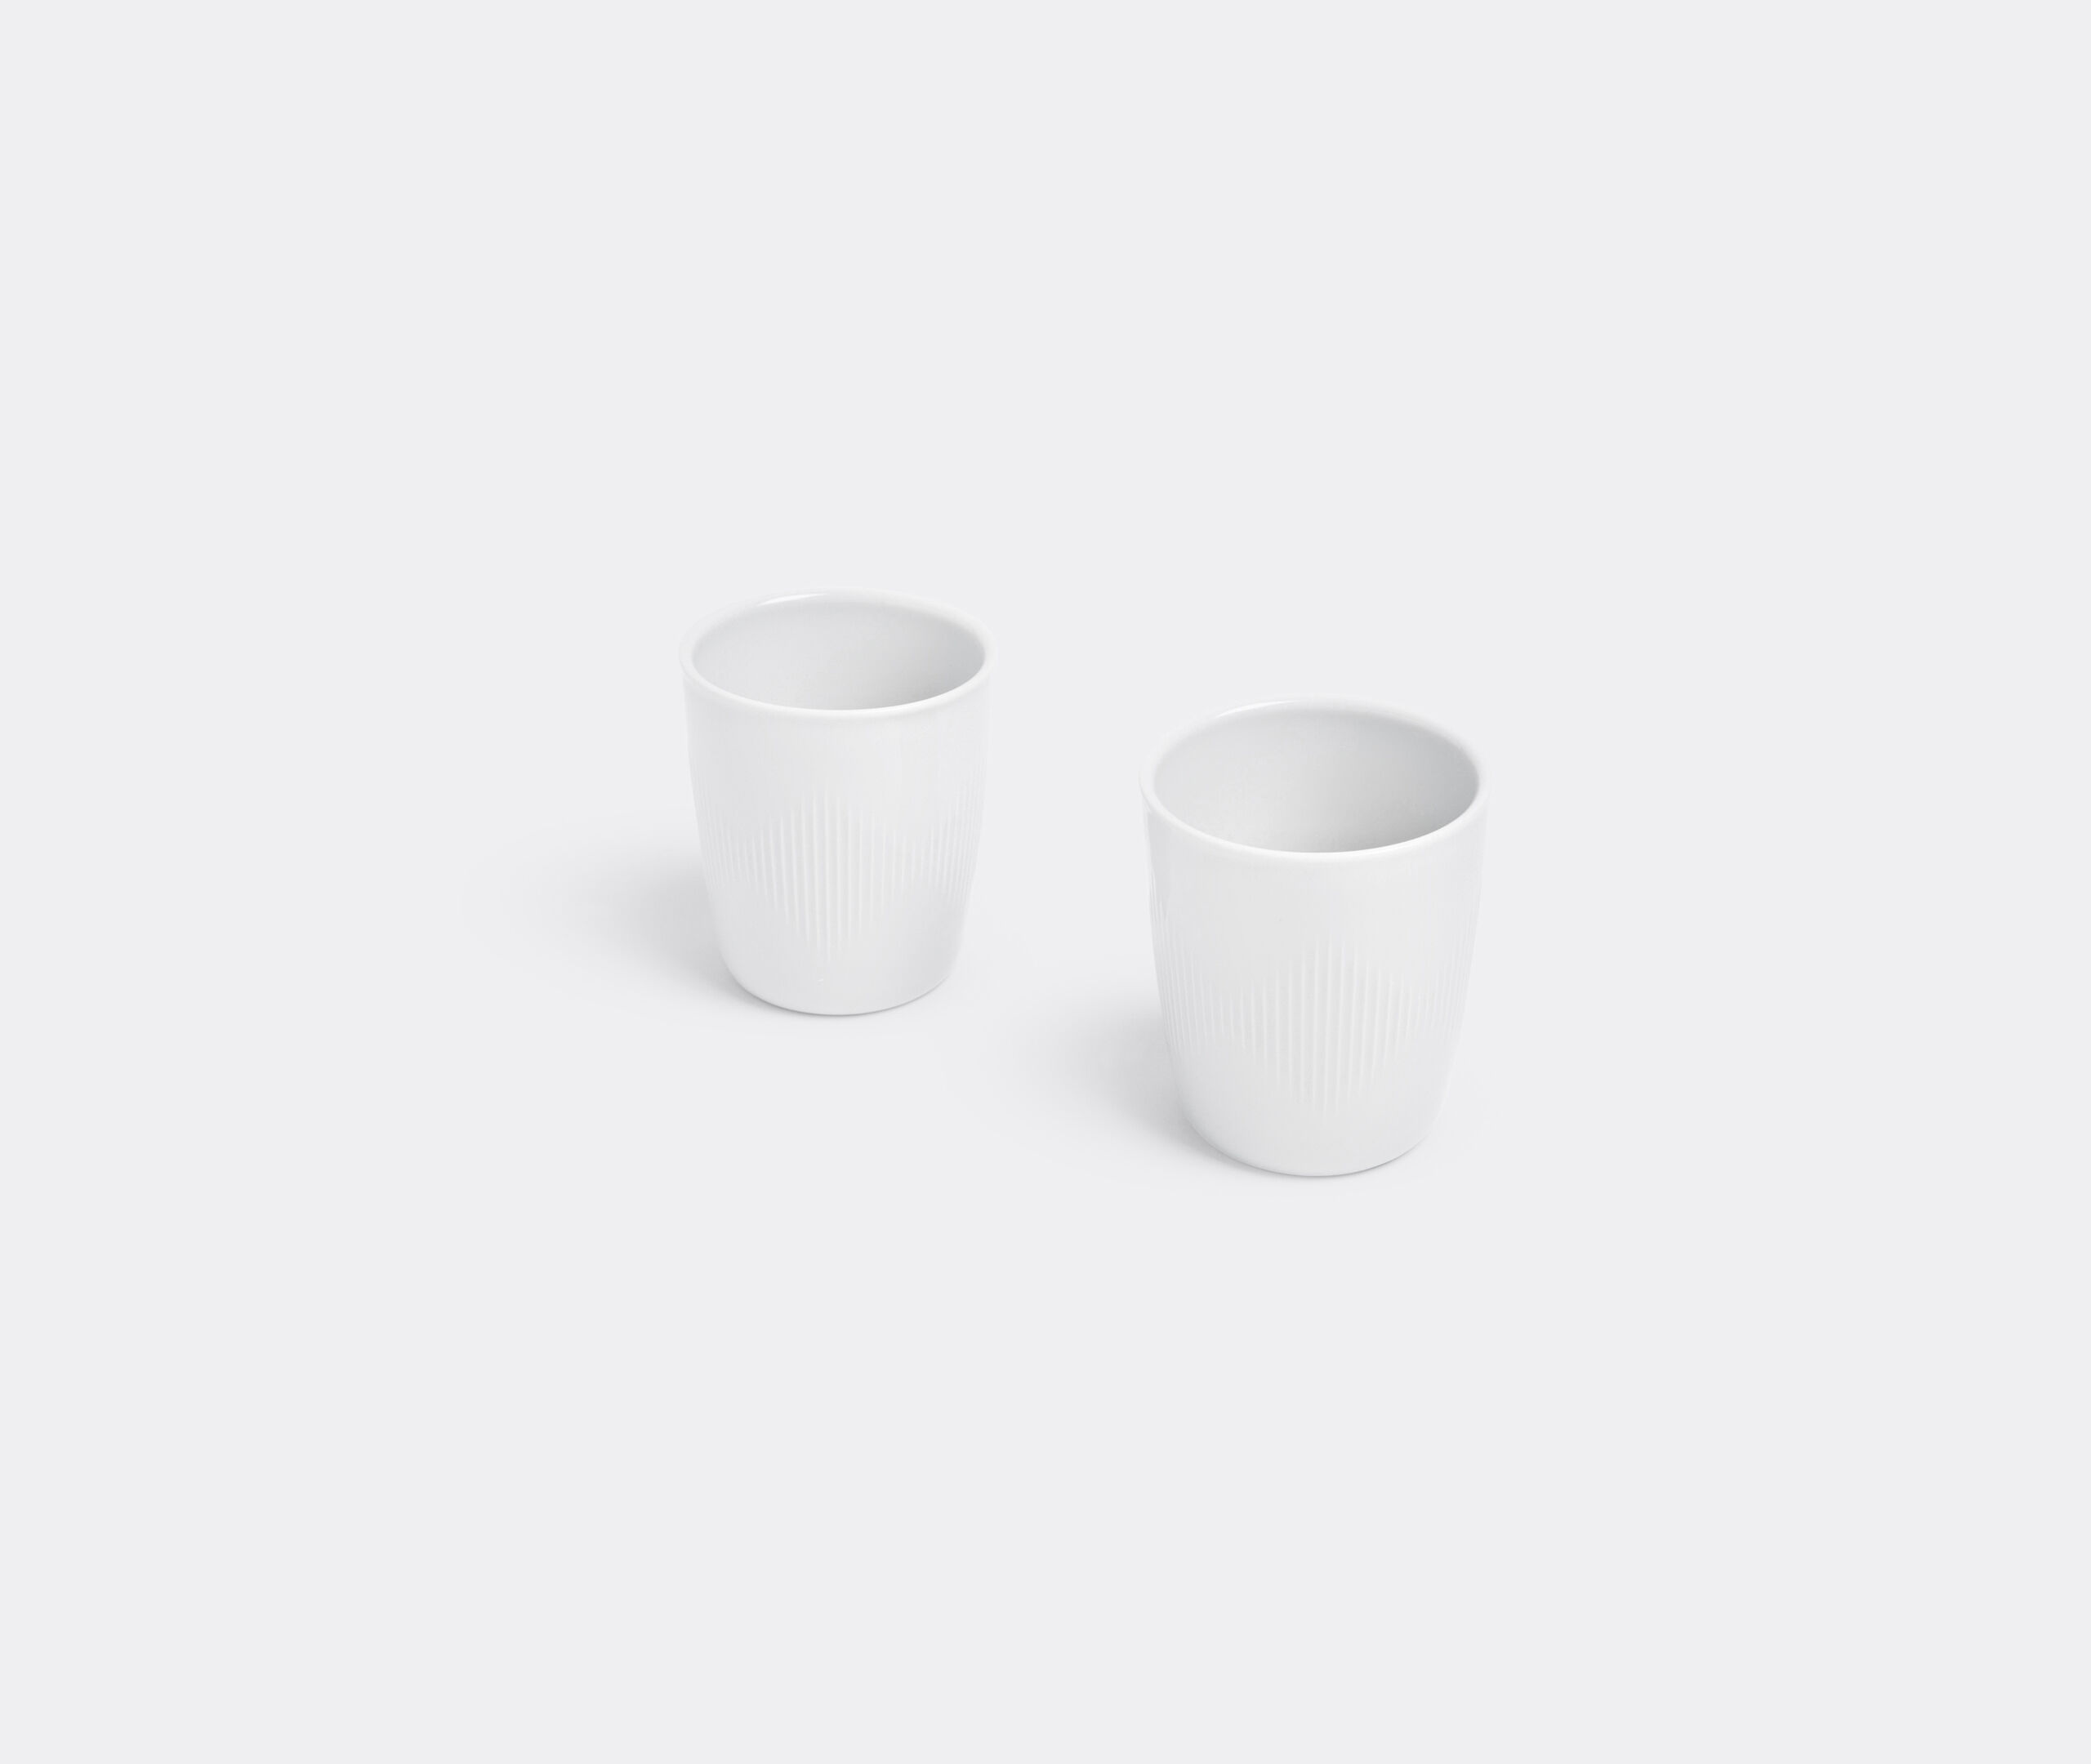 Thermodan Thermal Coffee Mug, White (2 Pcs.)